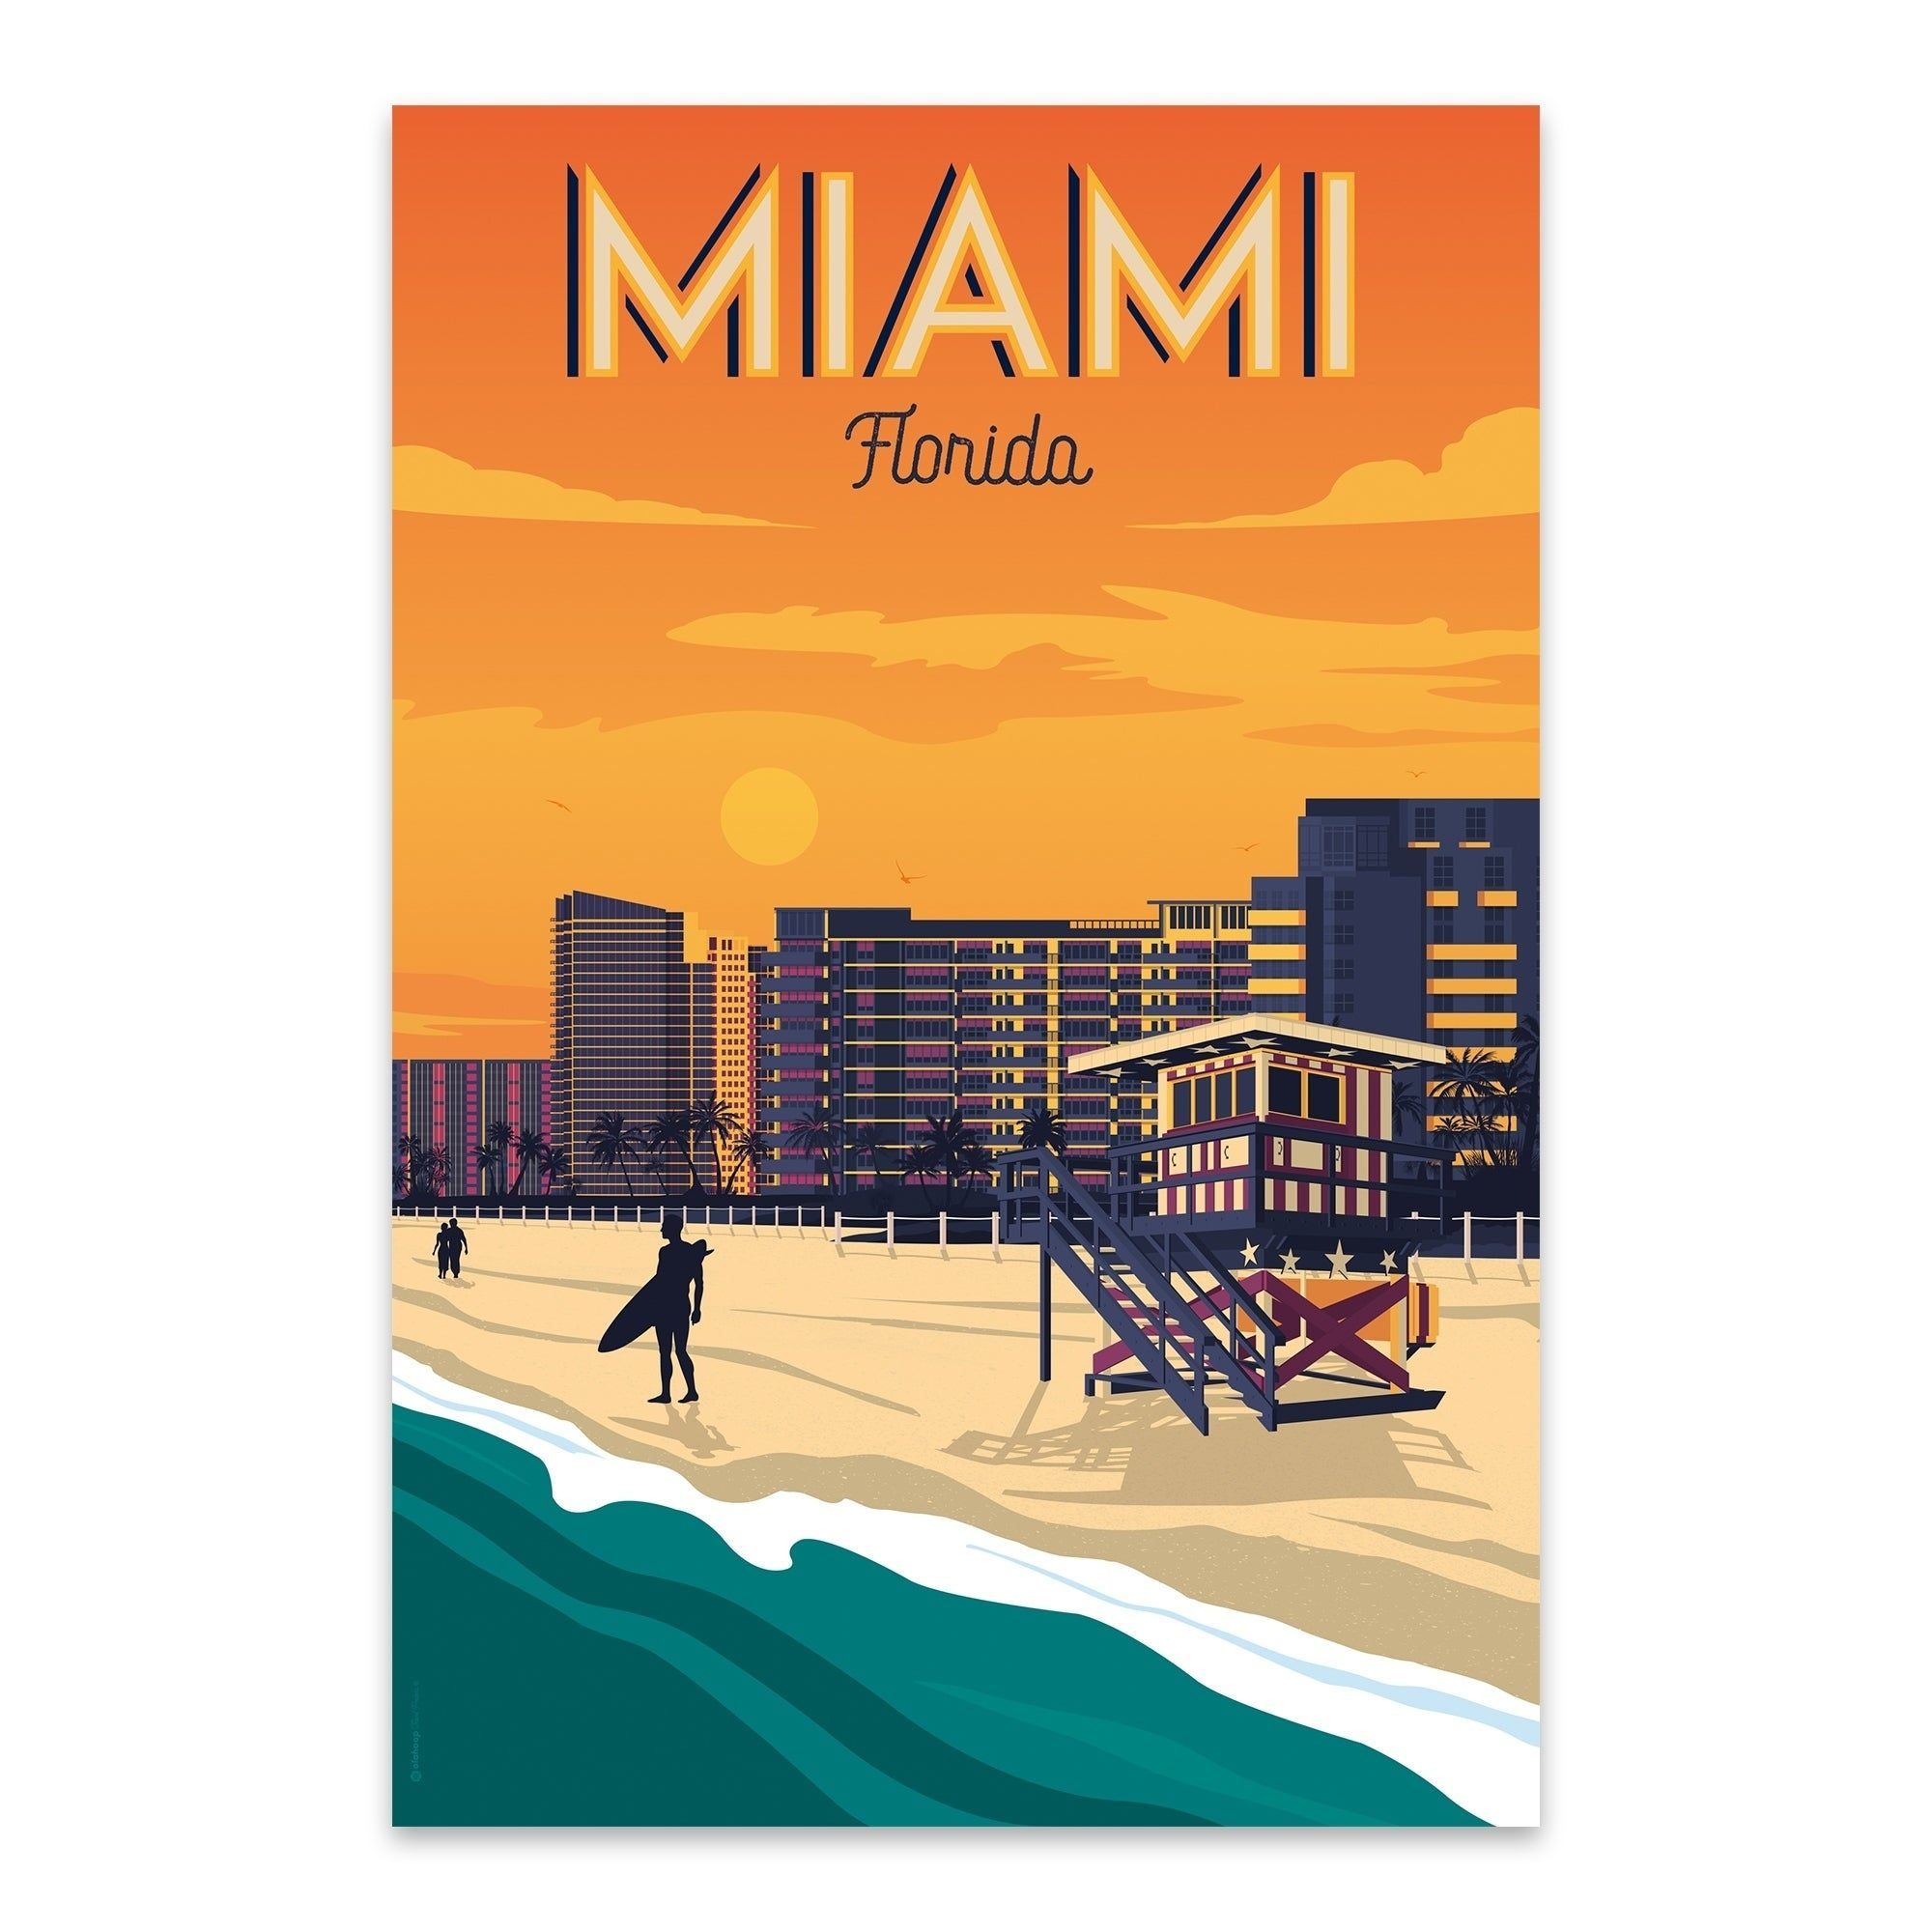 Retro Nostalgic Home Art Print Wall Decor poster A3 miami beach USA